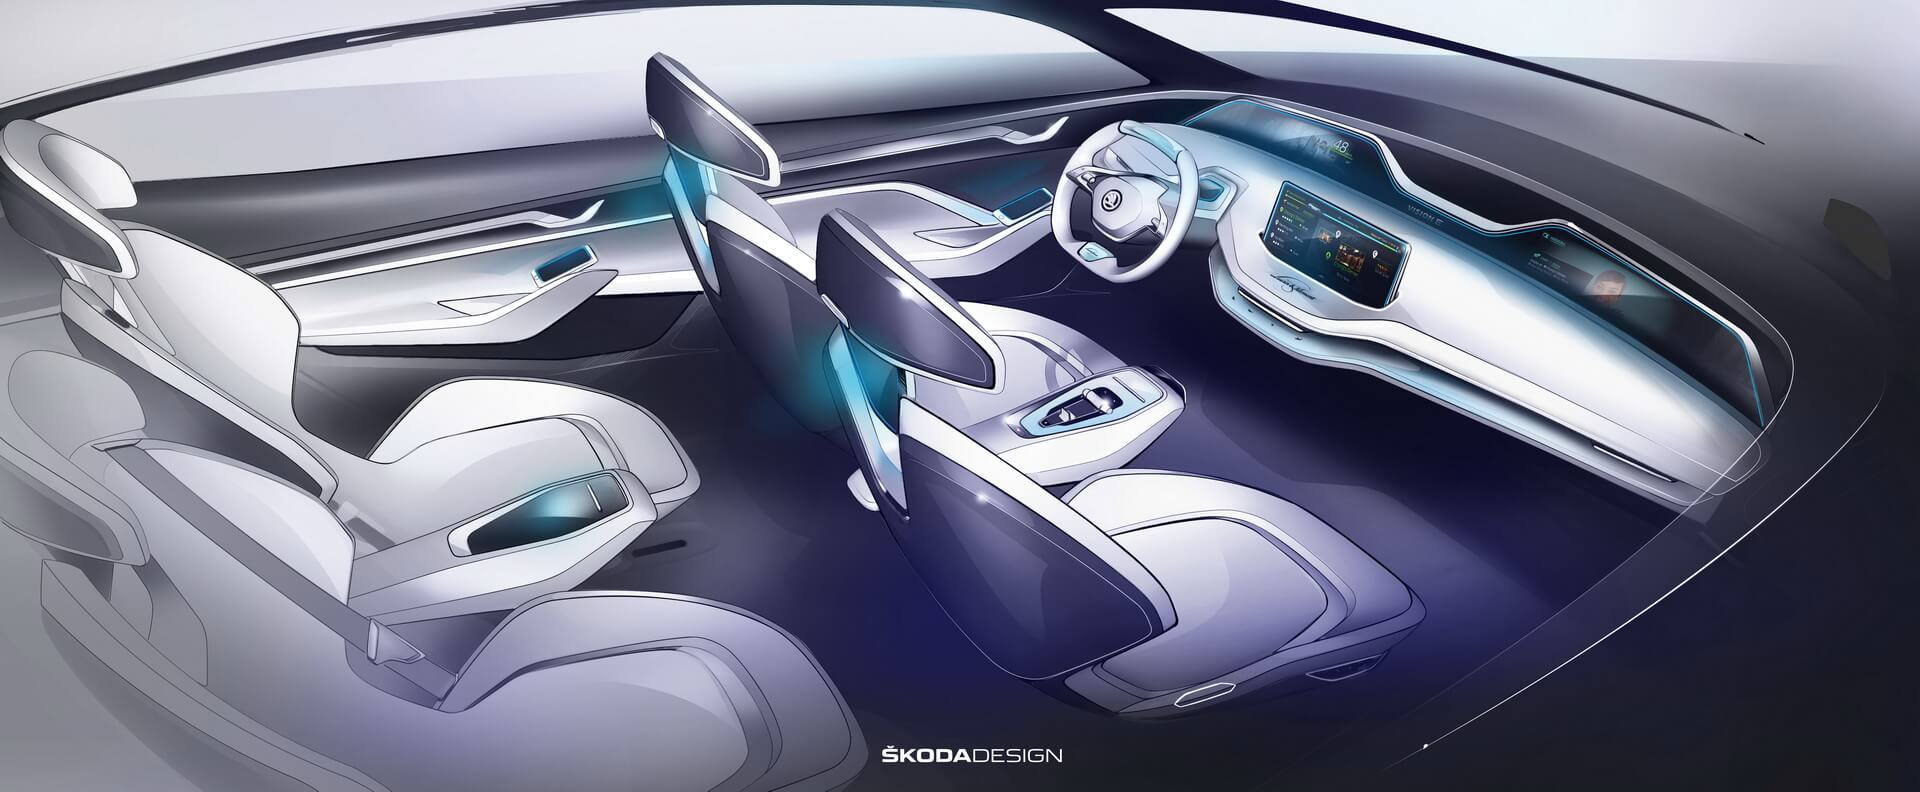 Салон электромобиля Skoda Vision E